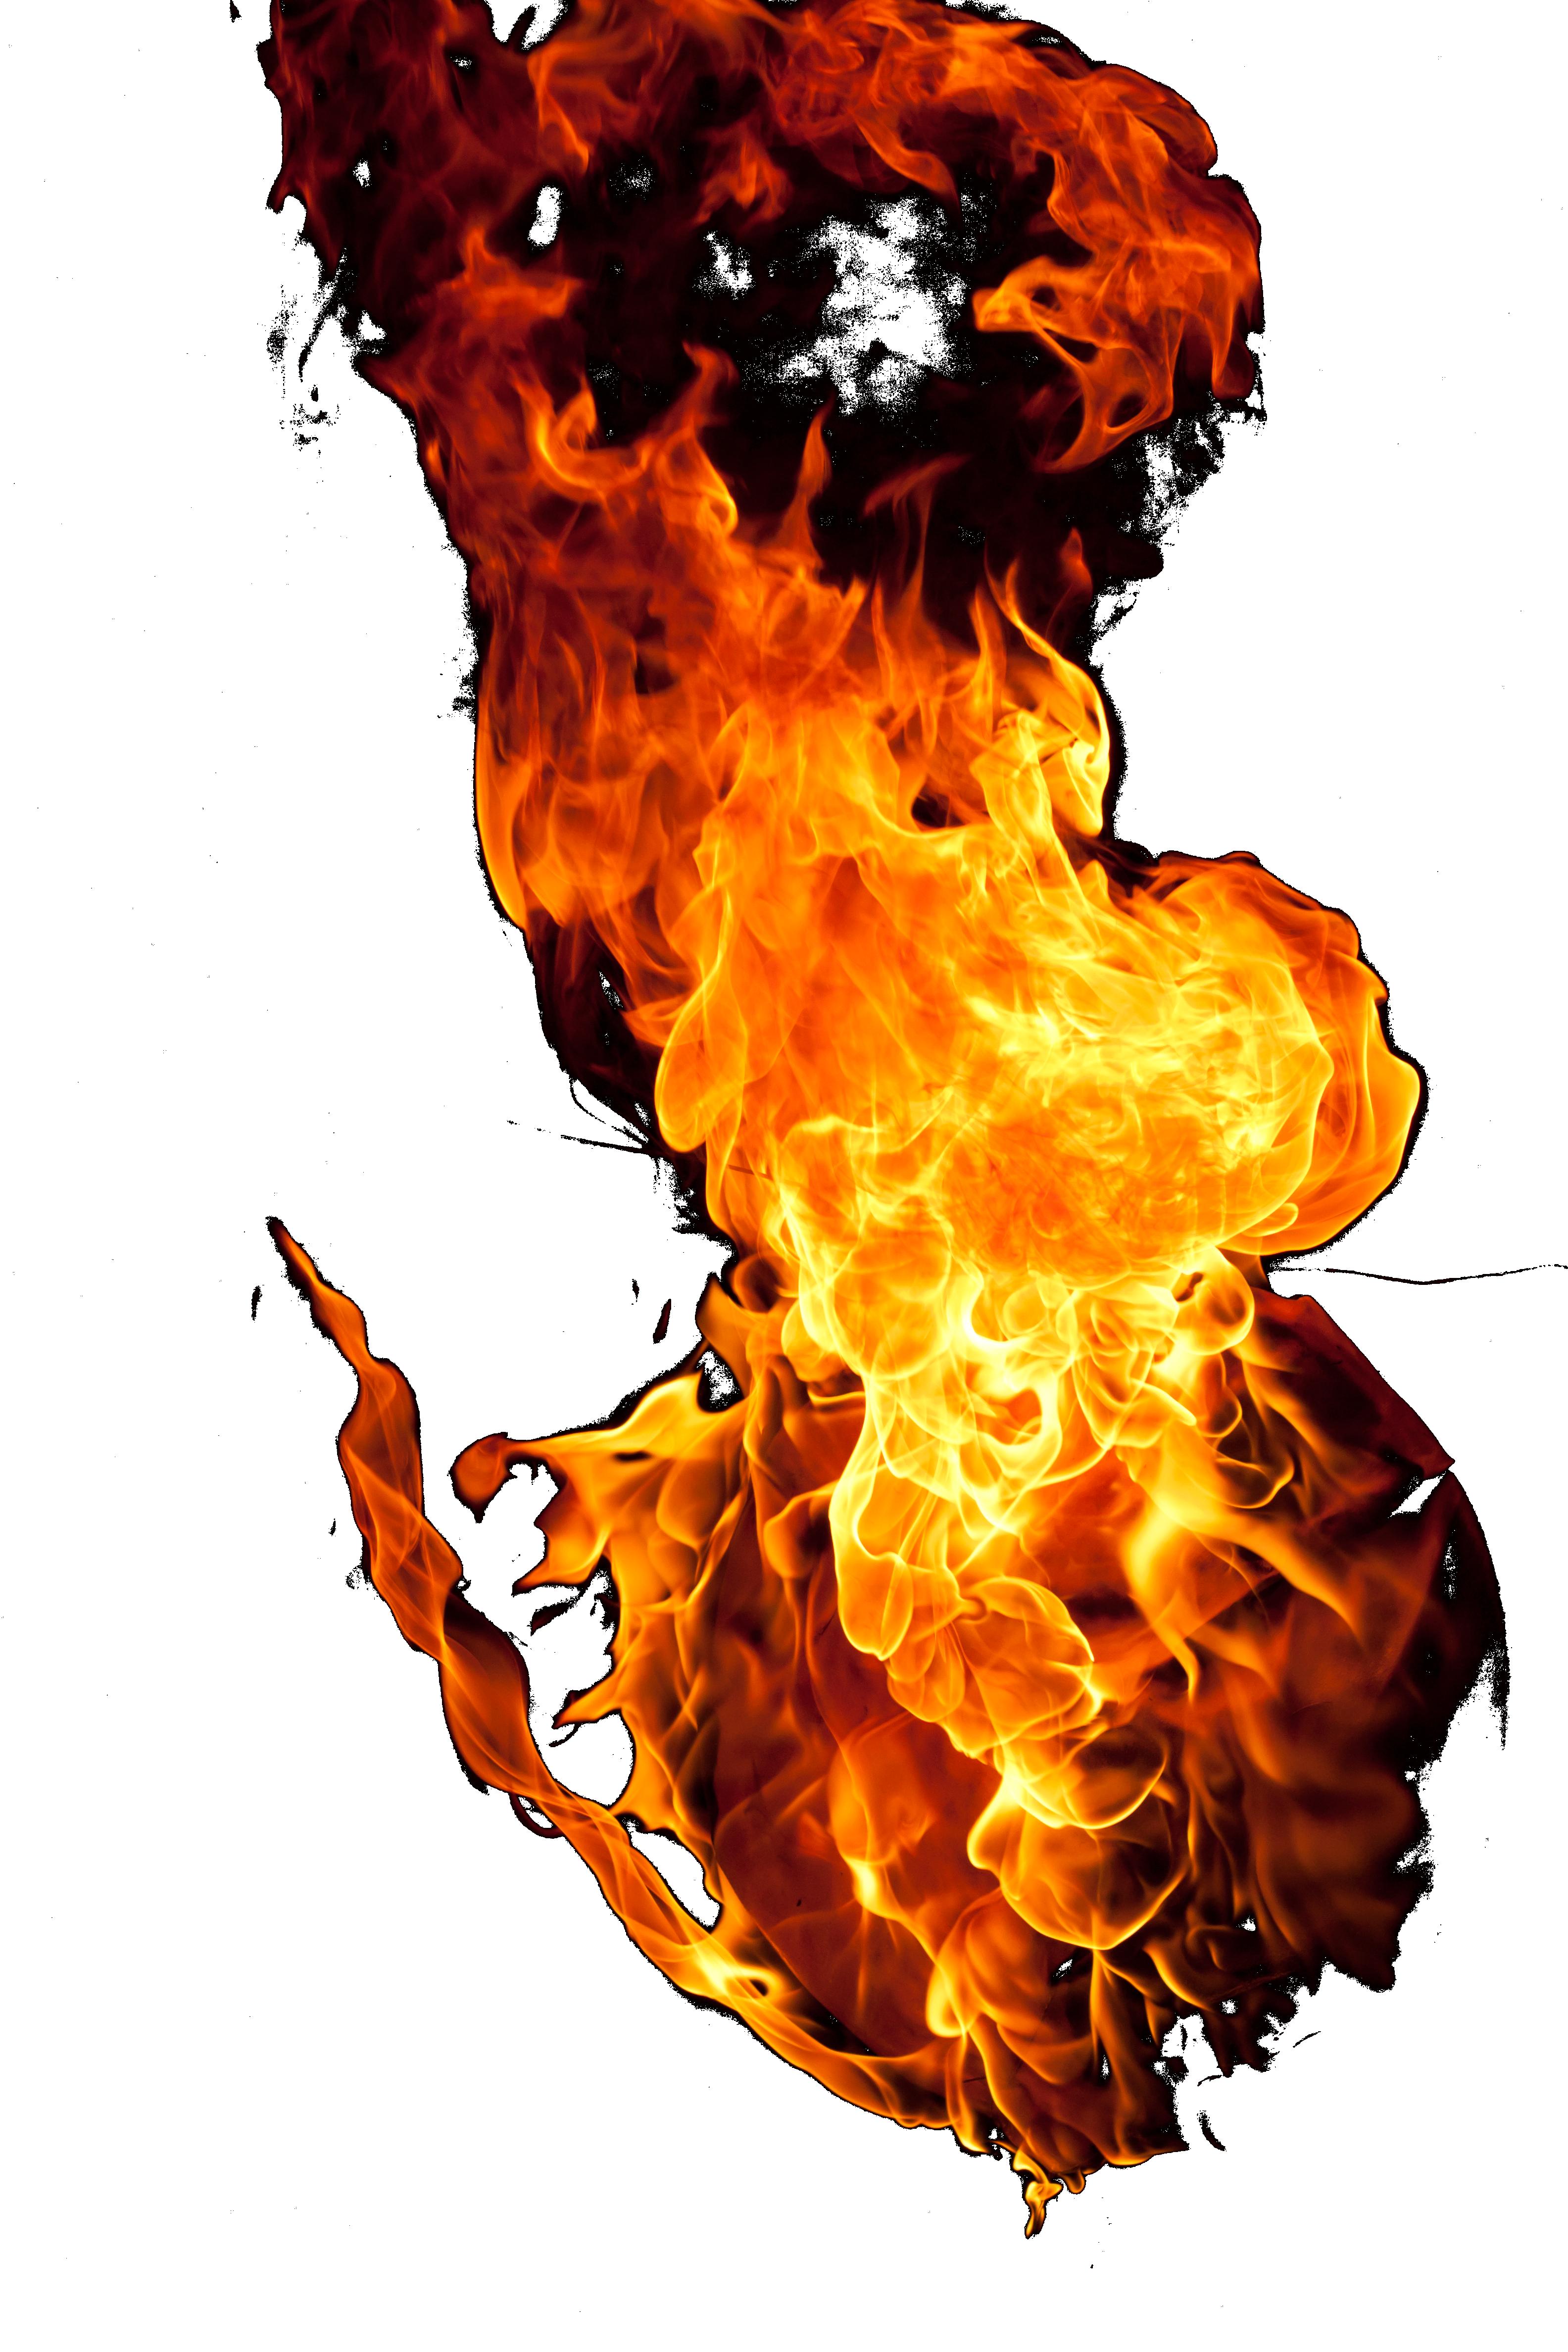 Fire HD PNG - 89212